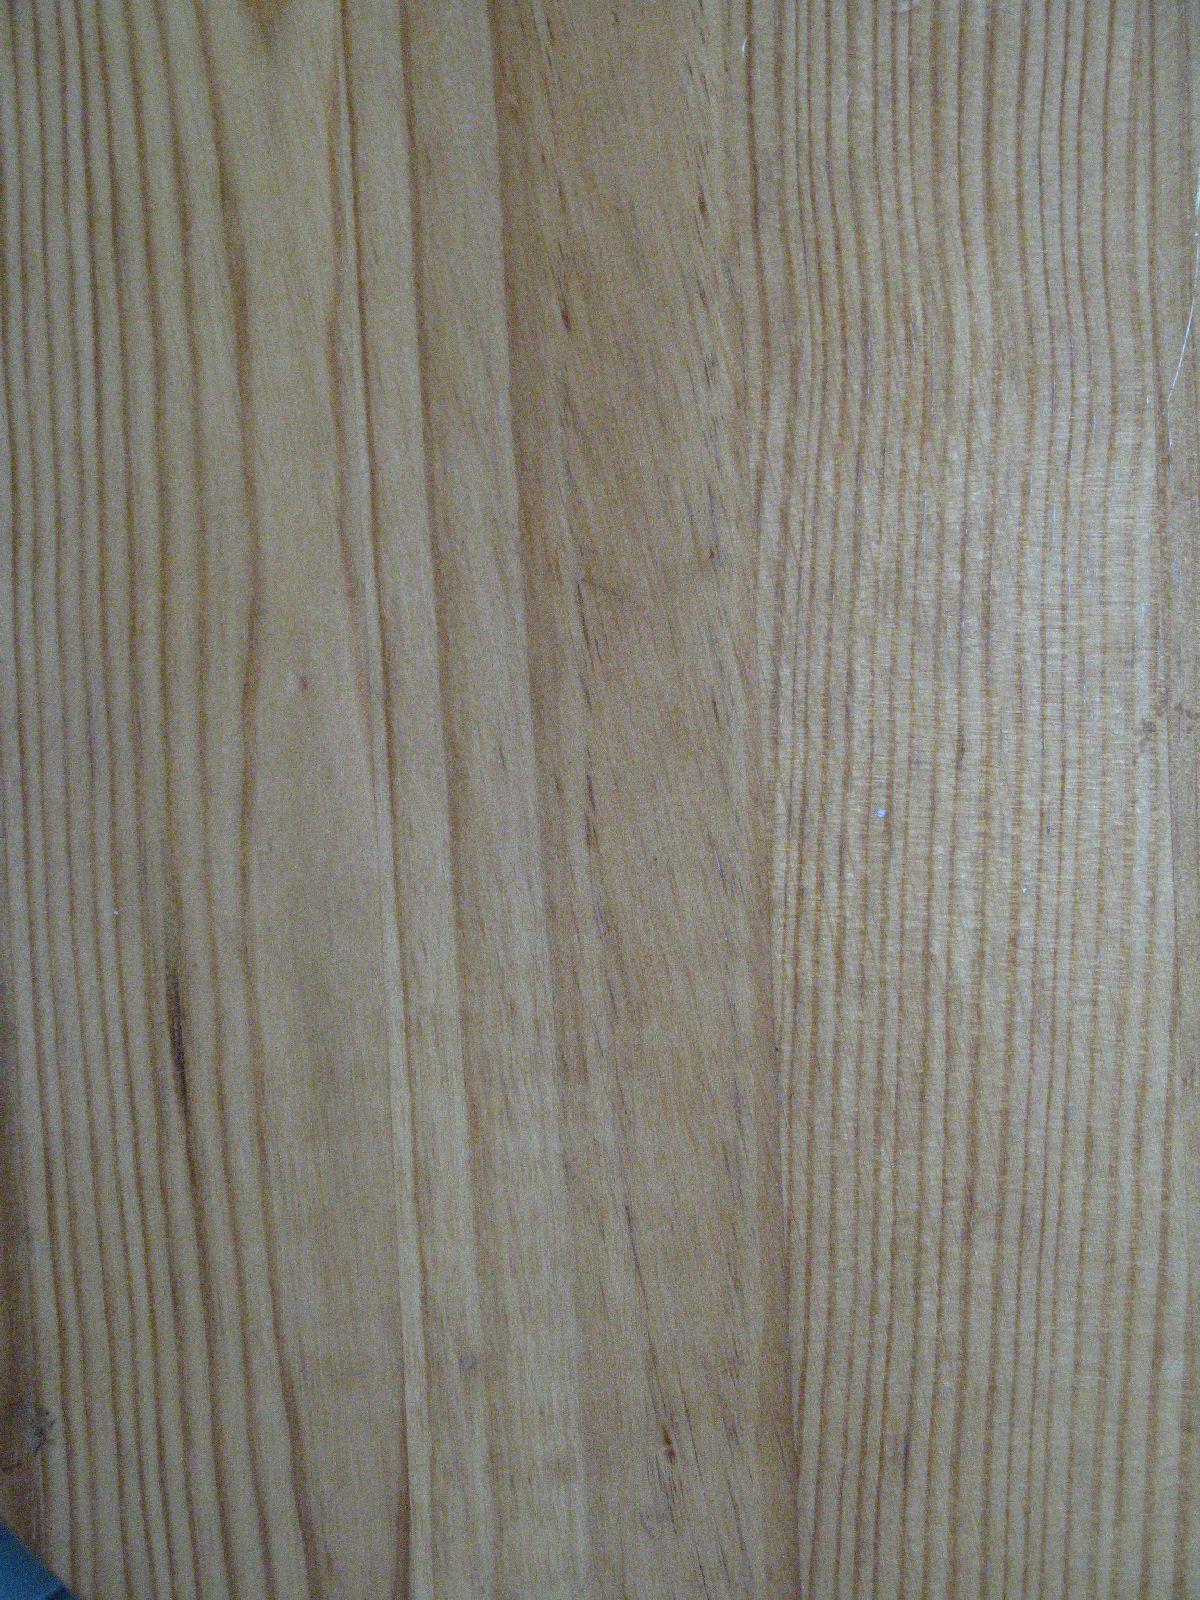 Wood_Textures_B_03941